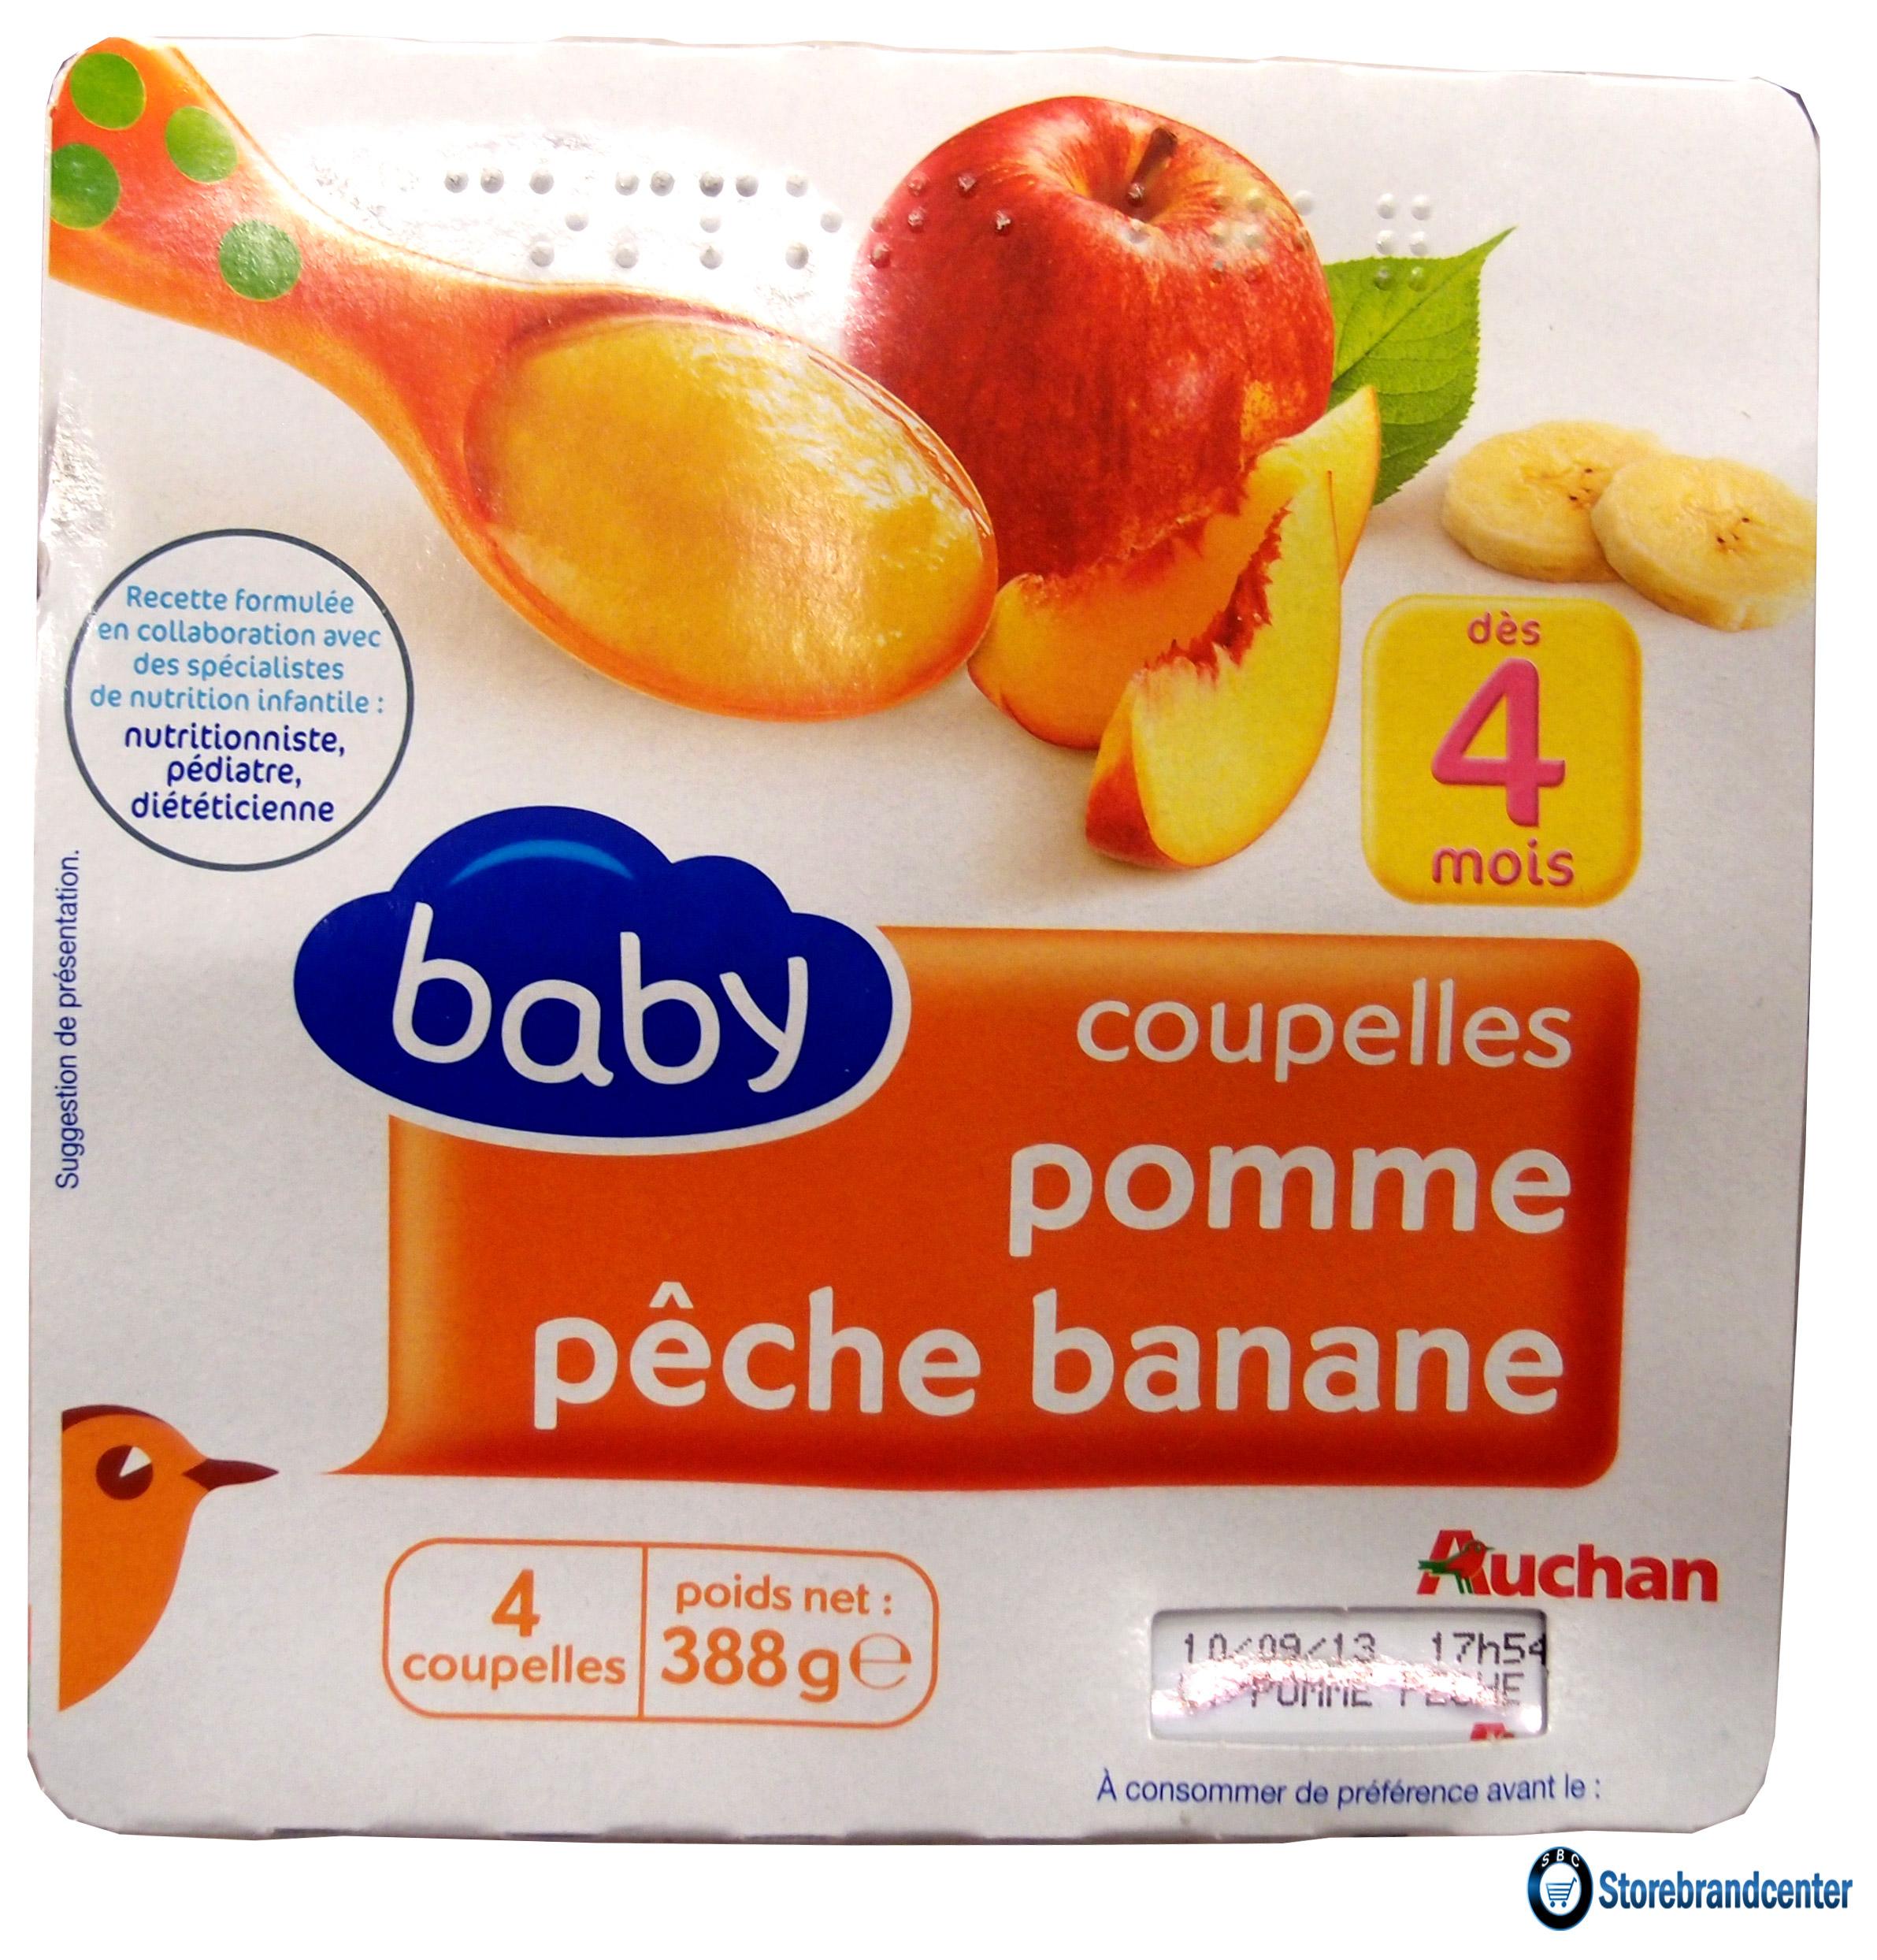 Lancement d'Auchan Baby en février 2008 - StoreBrandCenter